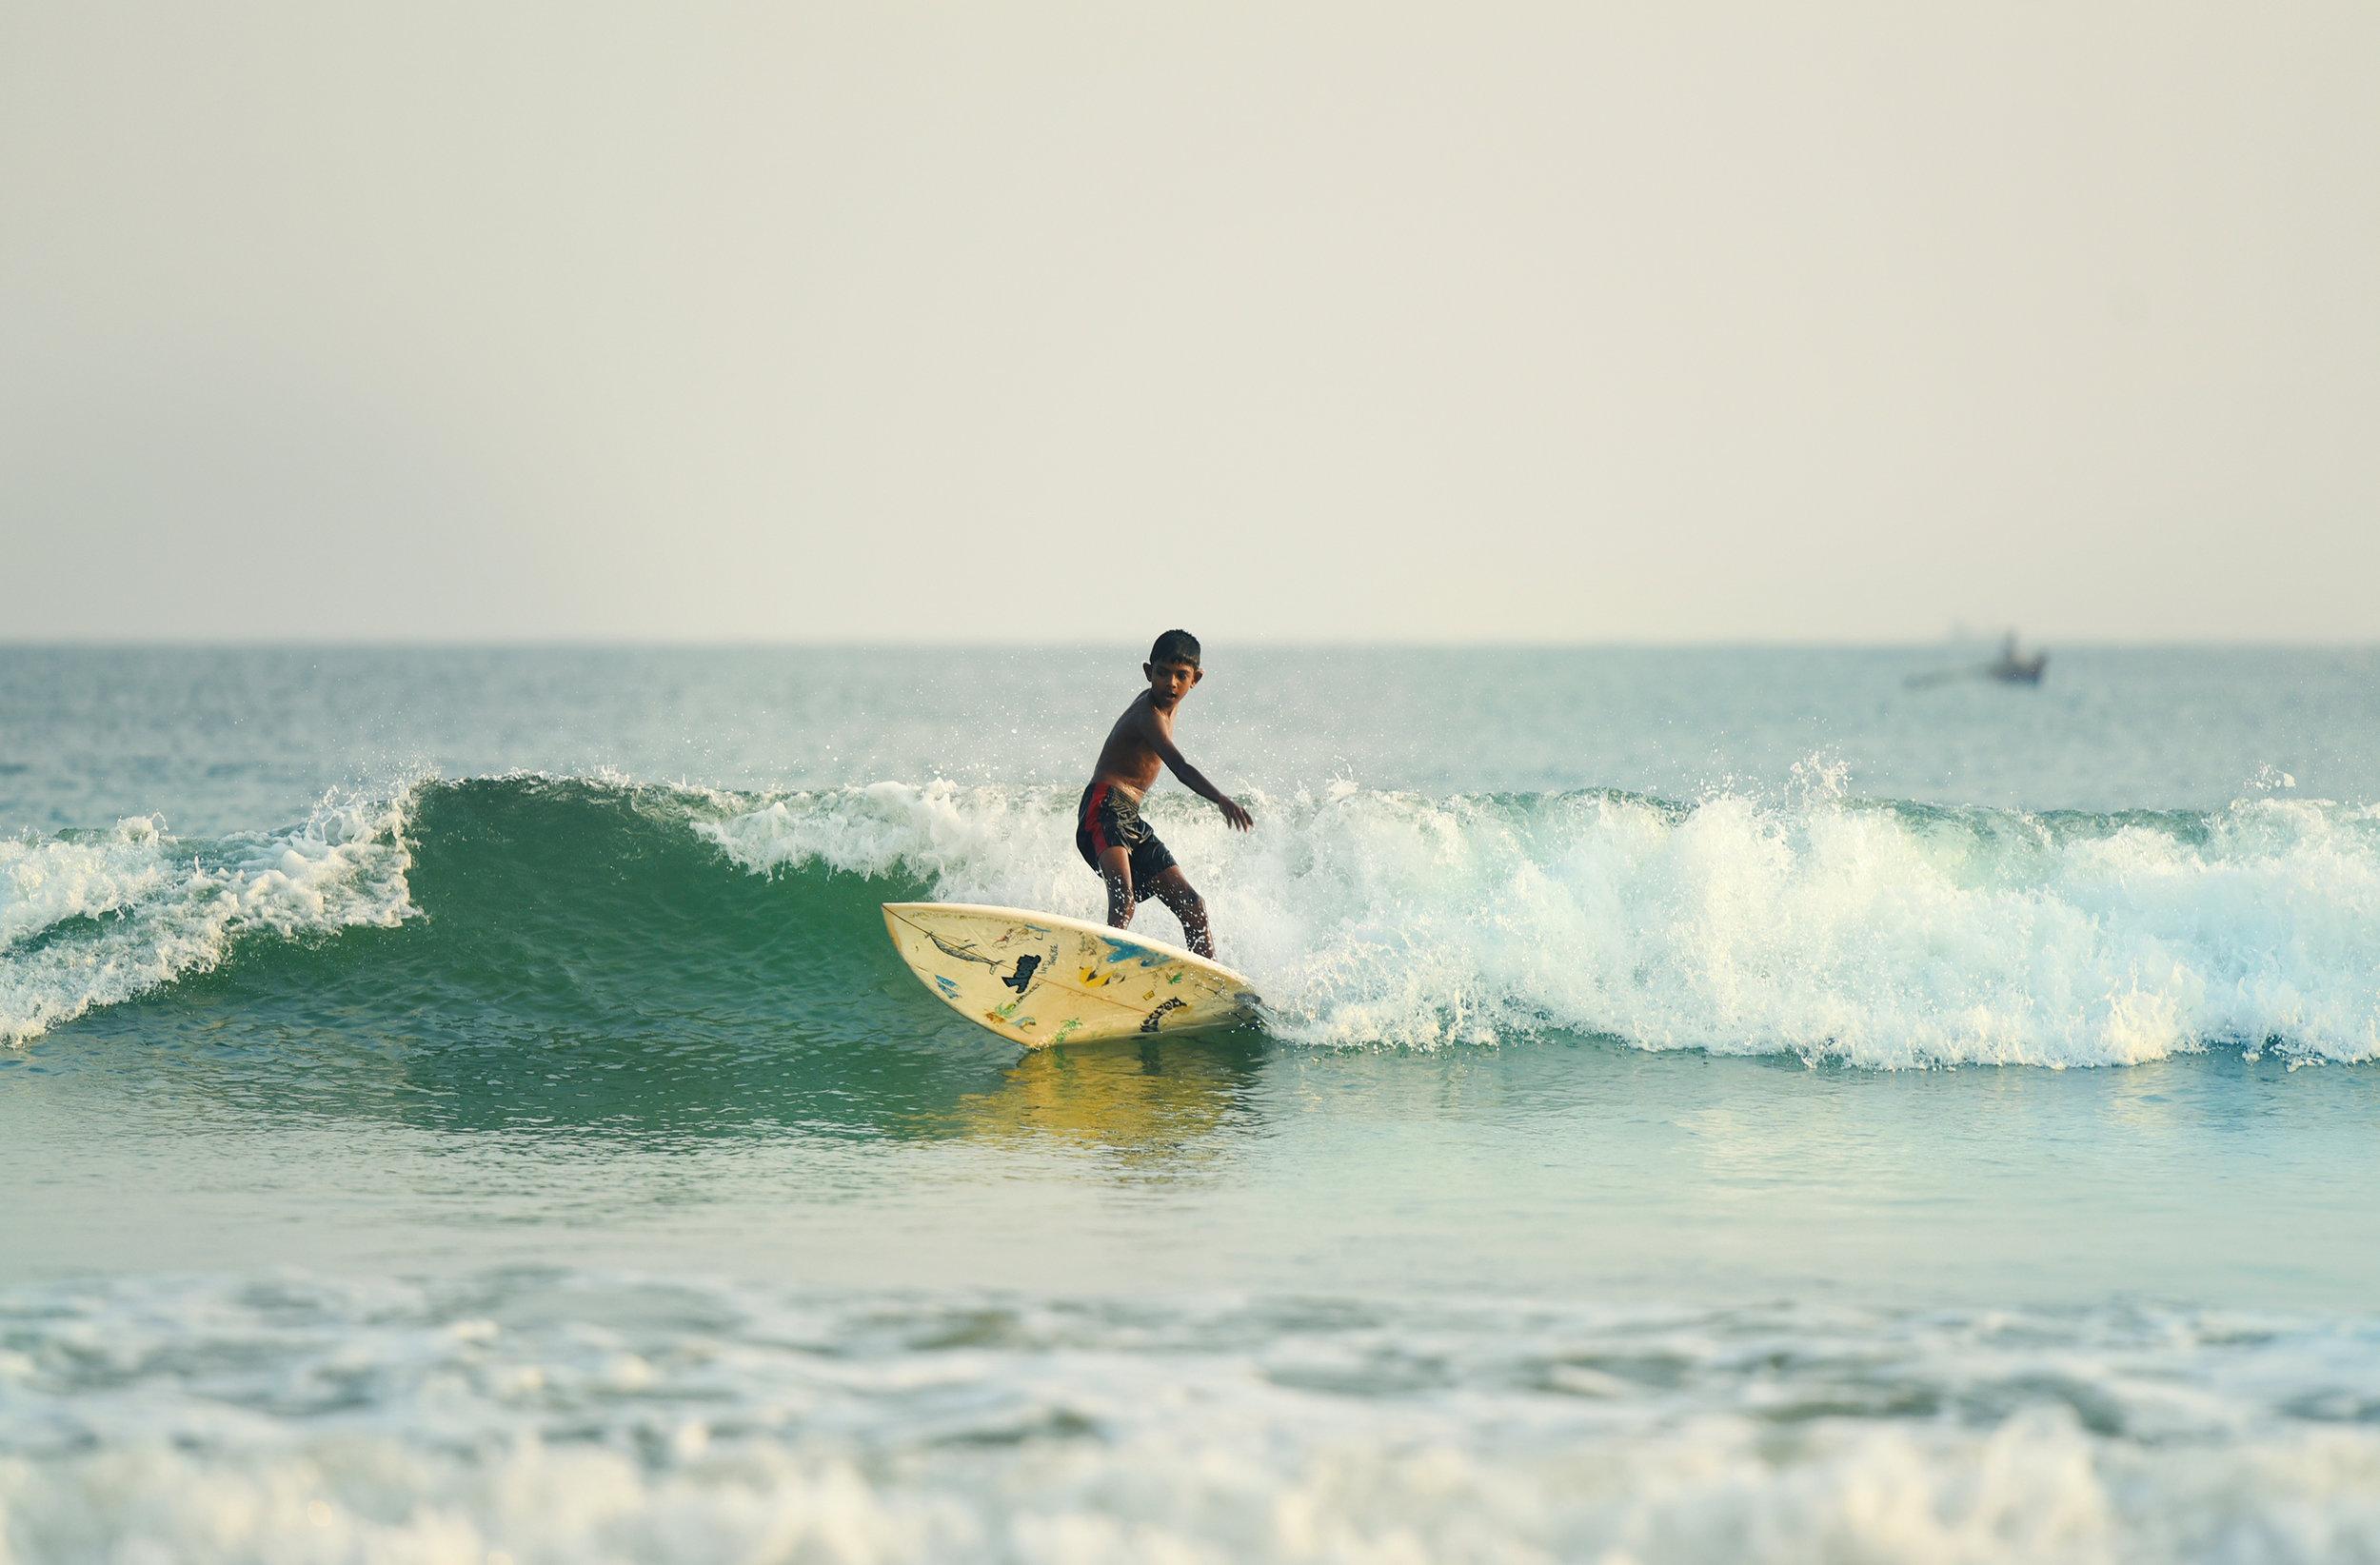 Grom local boy surfing in Sri Lanka